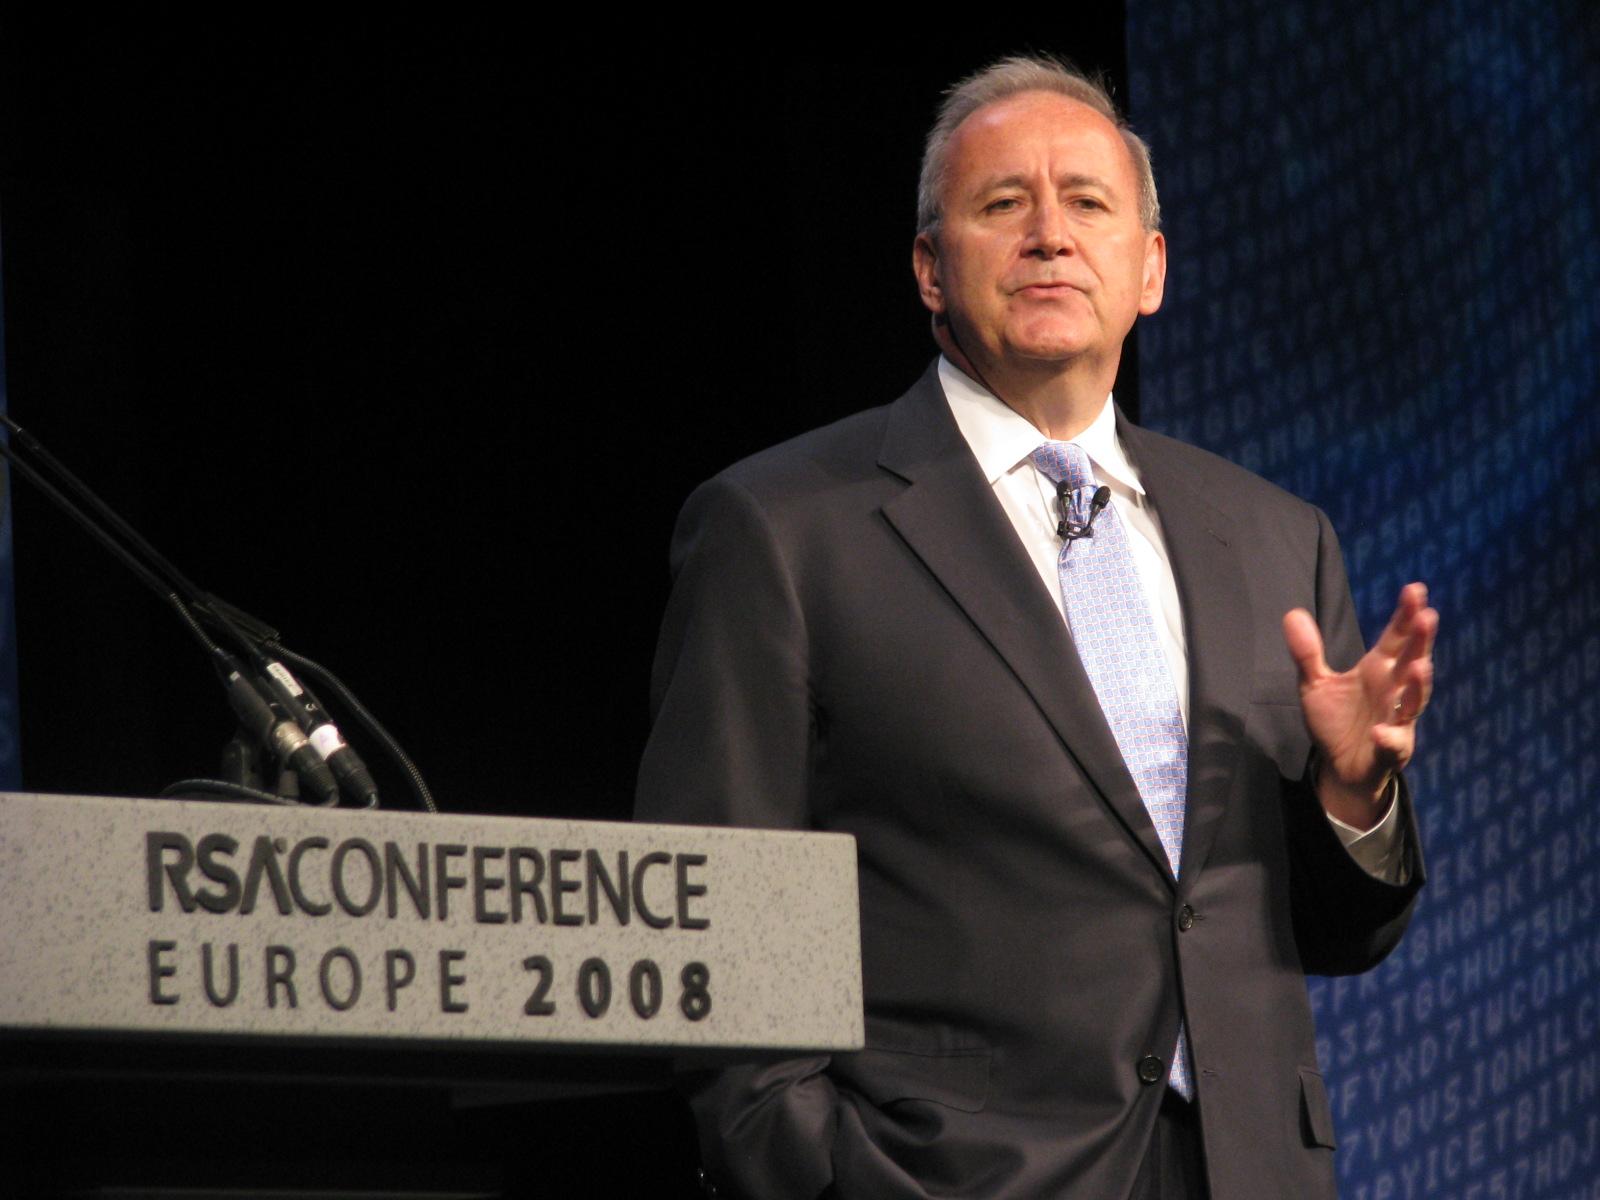 Keynote RSA Europe 2008